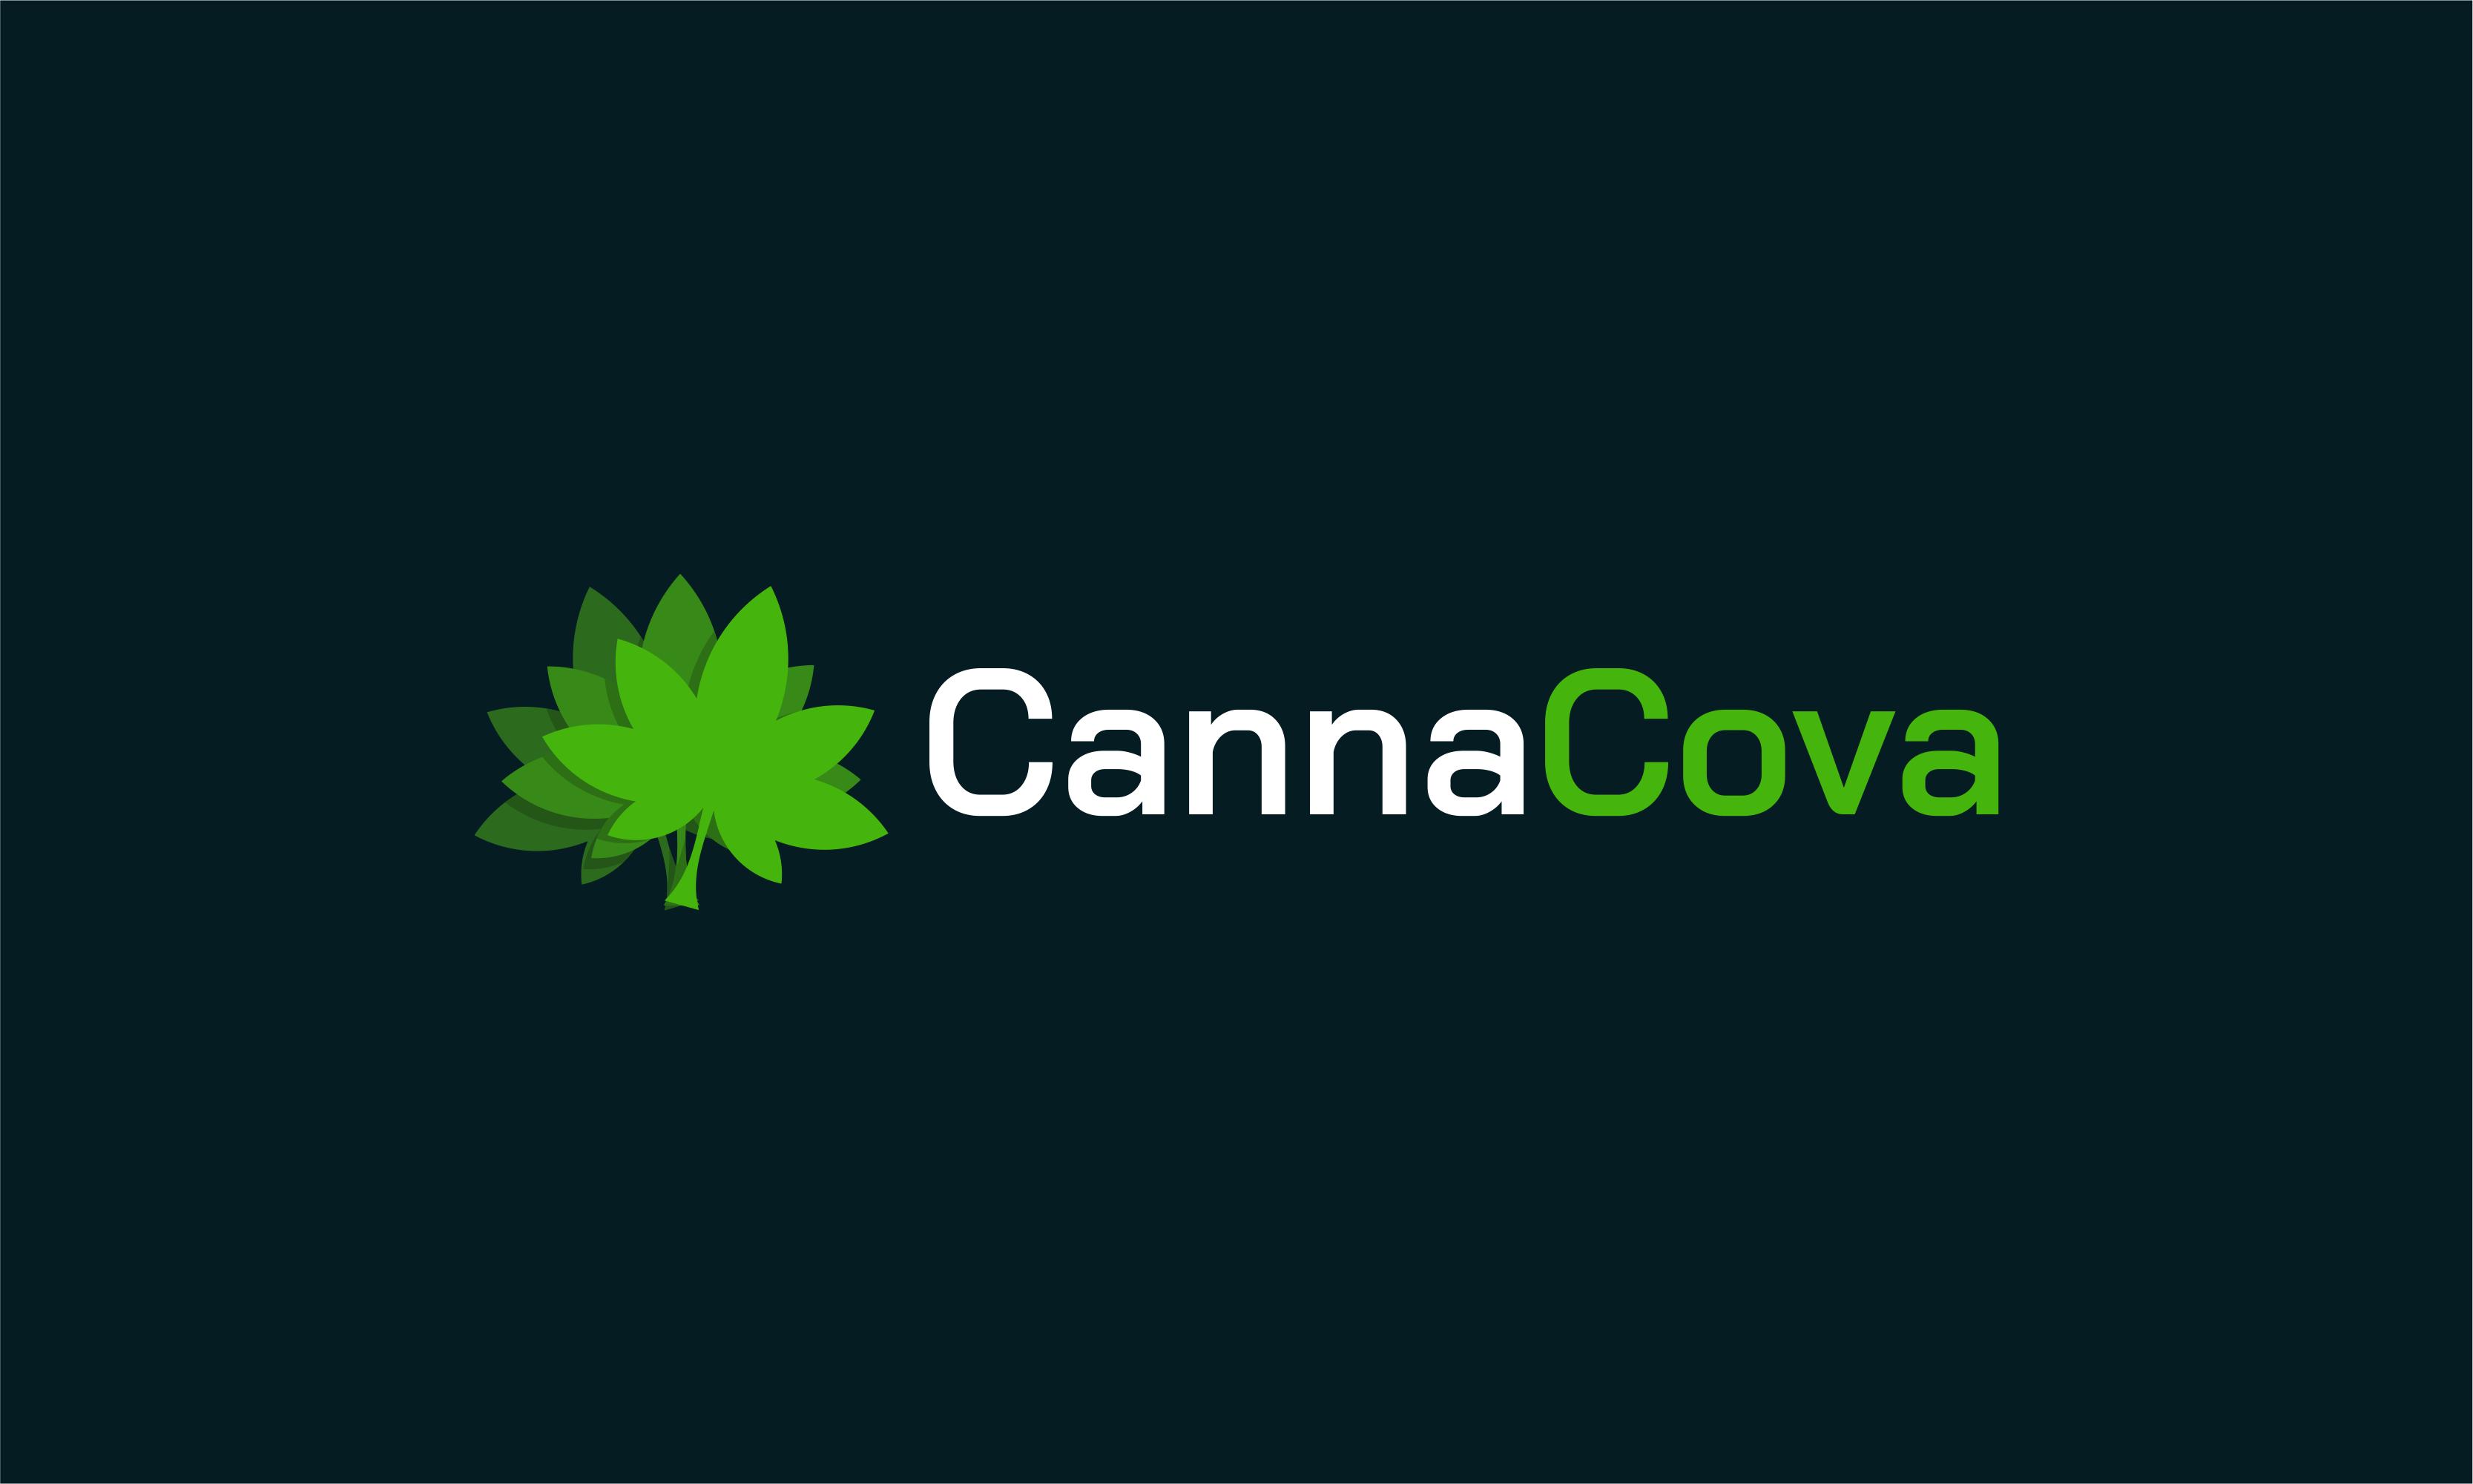 Cannacova